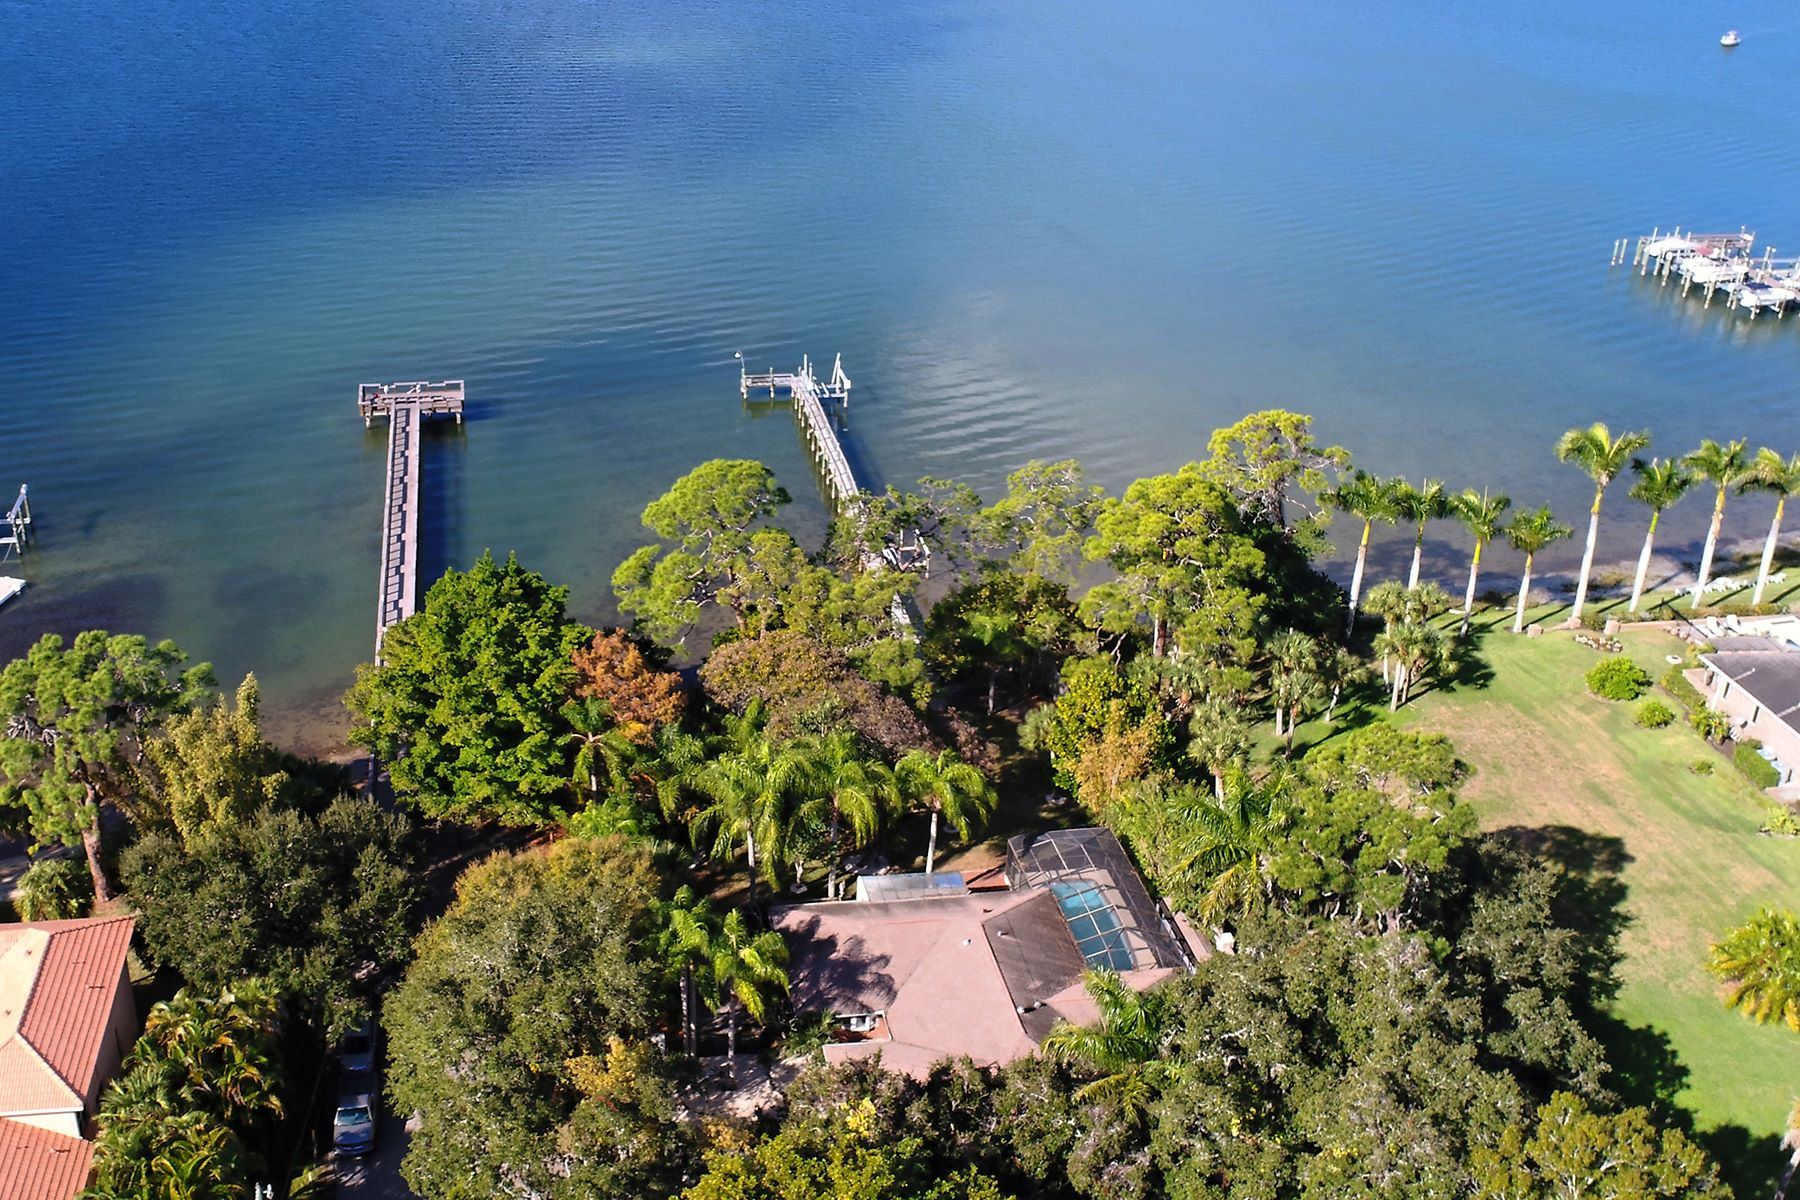 Land for Sale at VILLAGE OF OSPREY 128 Main St 5 Osprey, Florida, 34229 United States